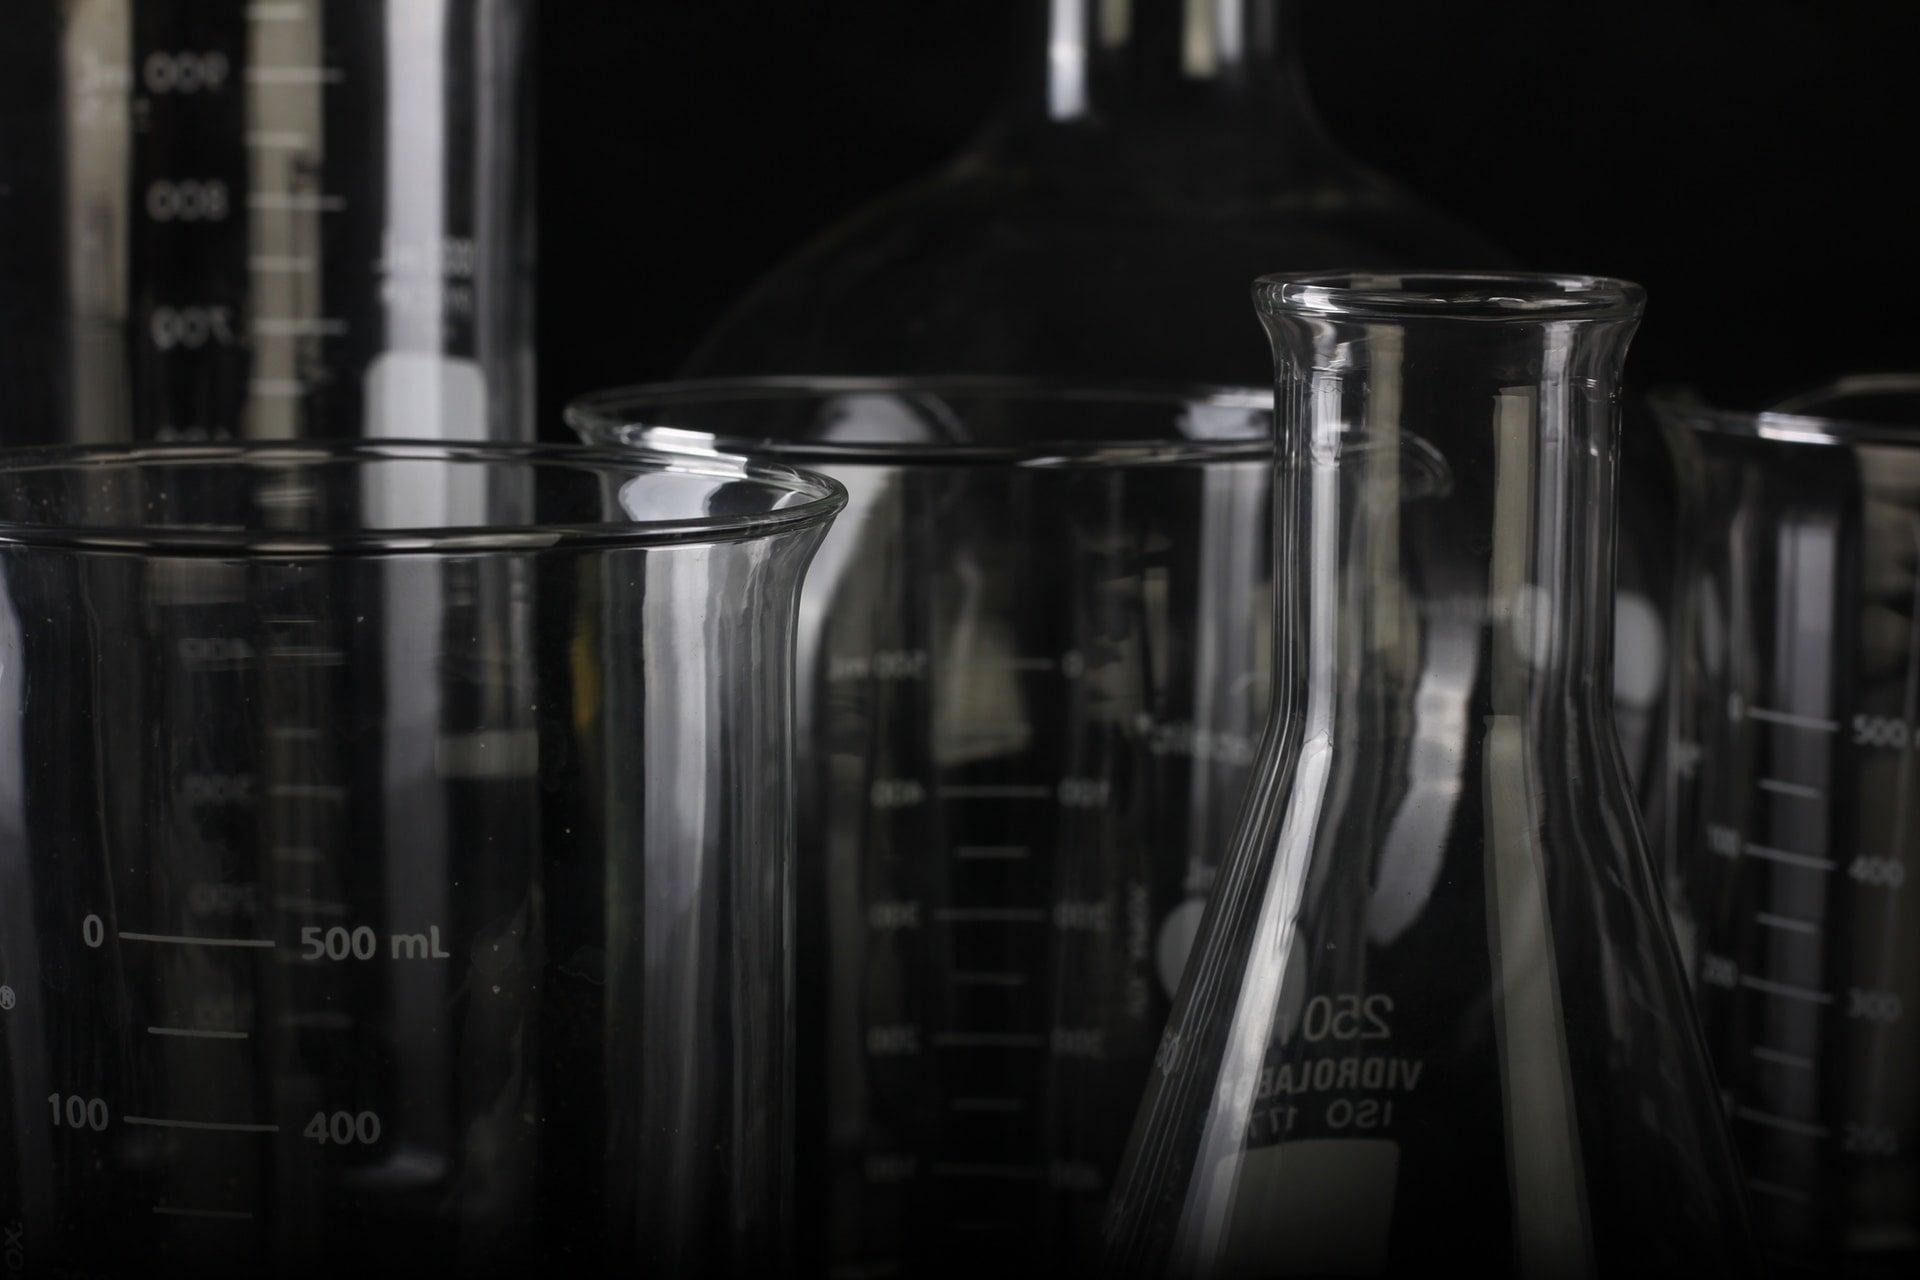 beaker biology chemical glass measuring cup lot laboratory 2